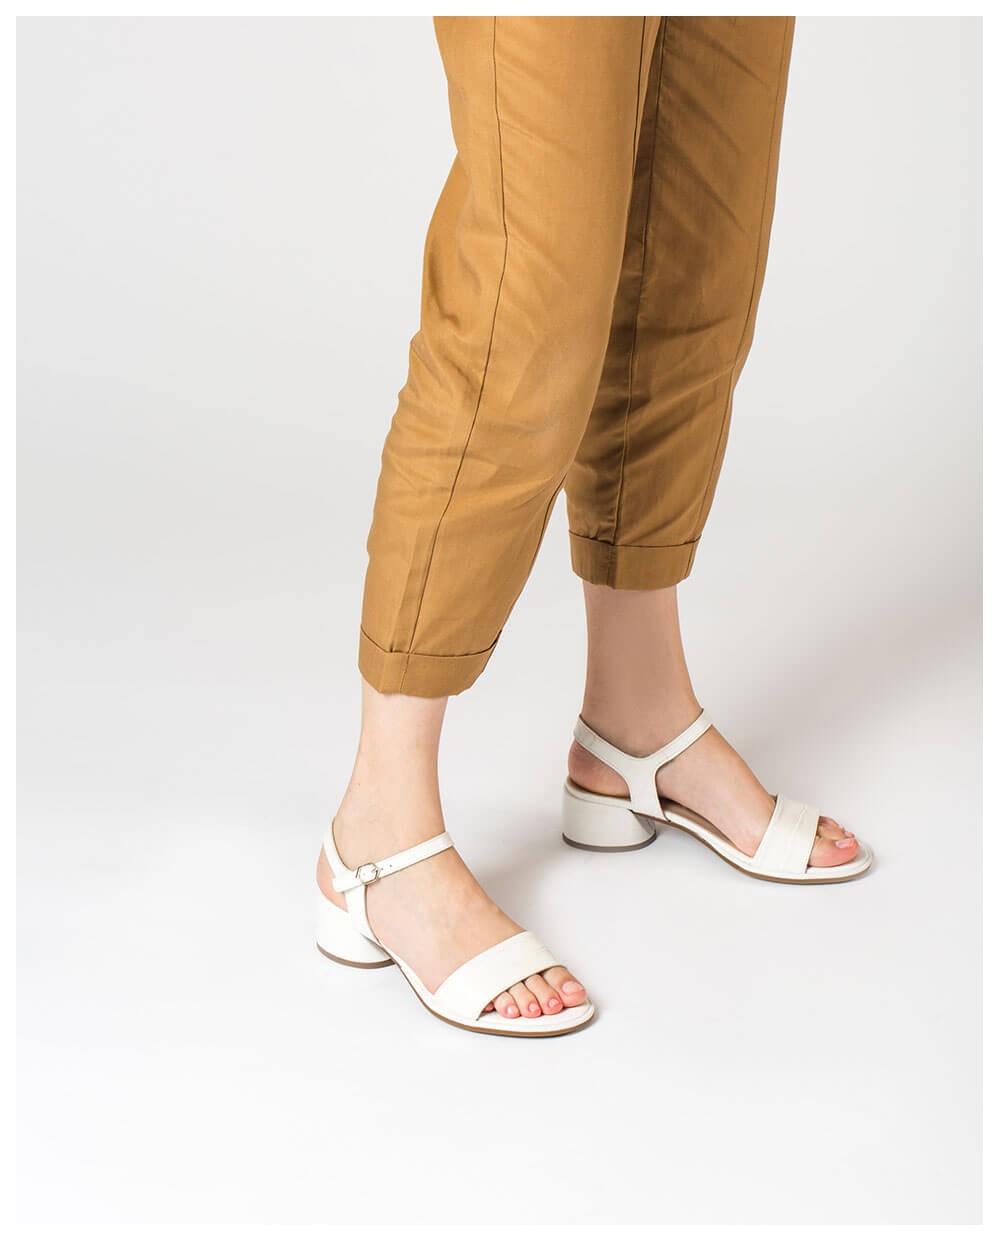 Wonders-Sandals-Mock croc leather sandal